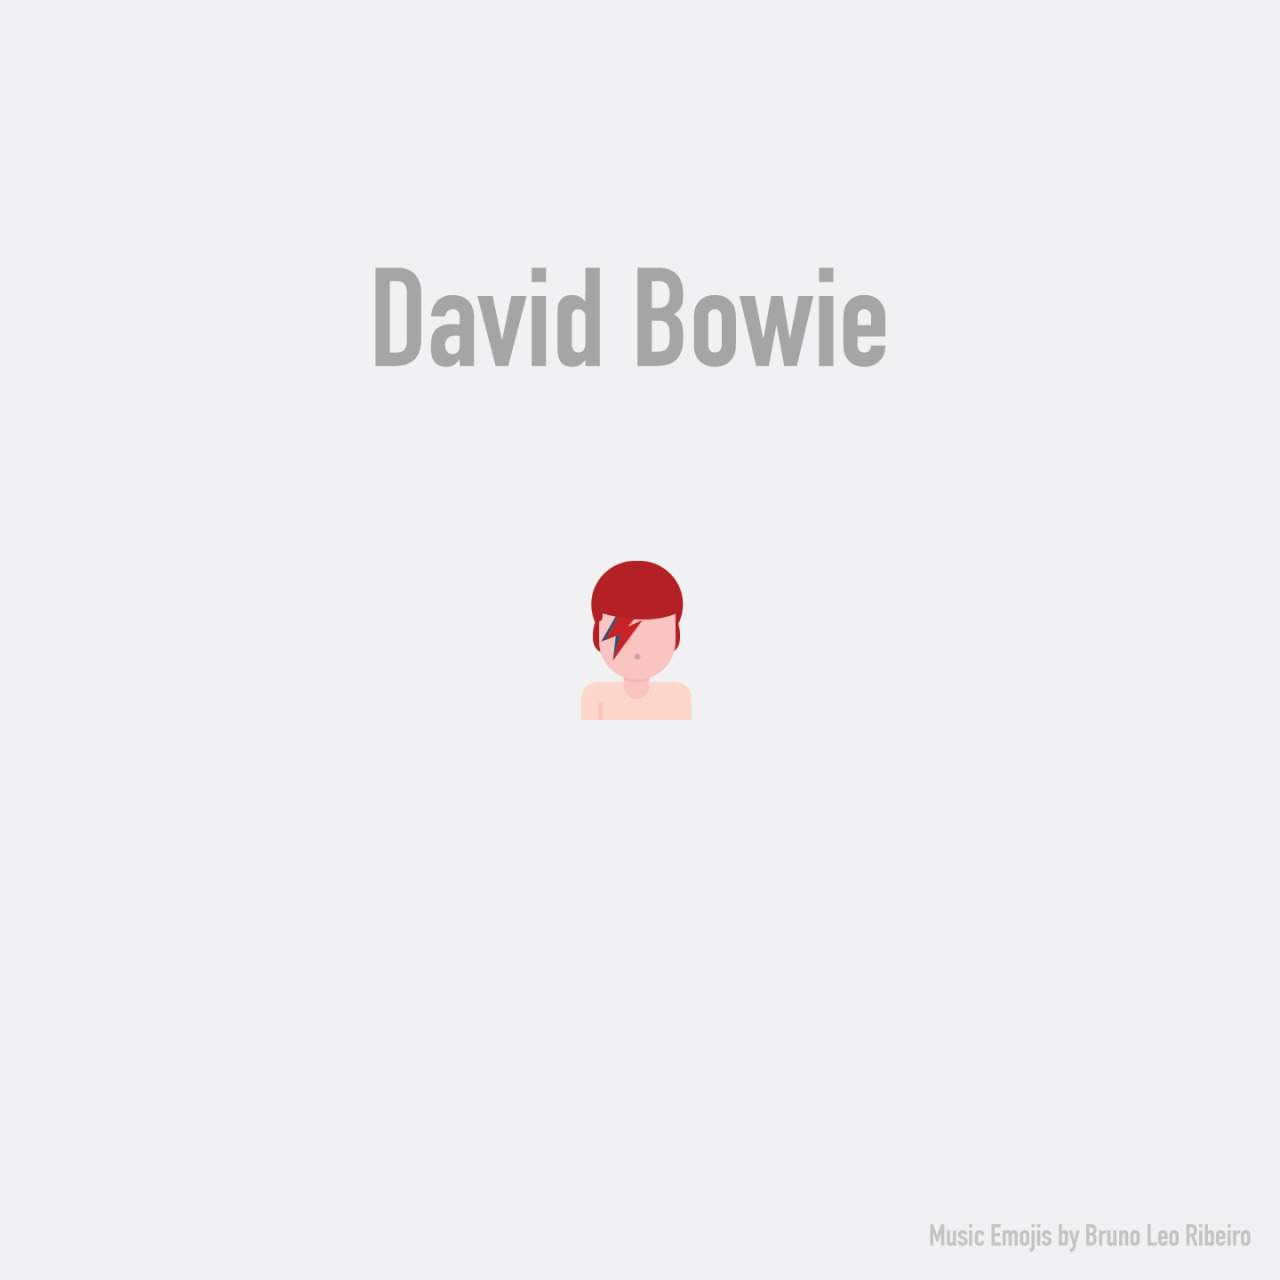 music-emoji15